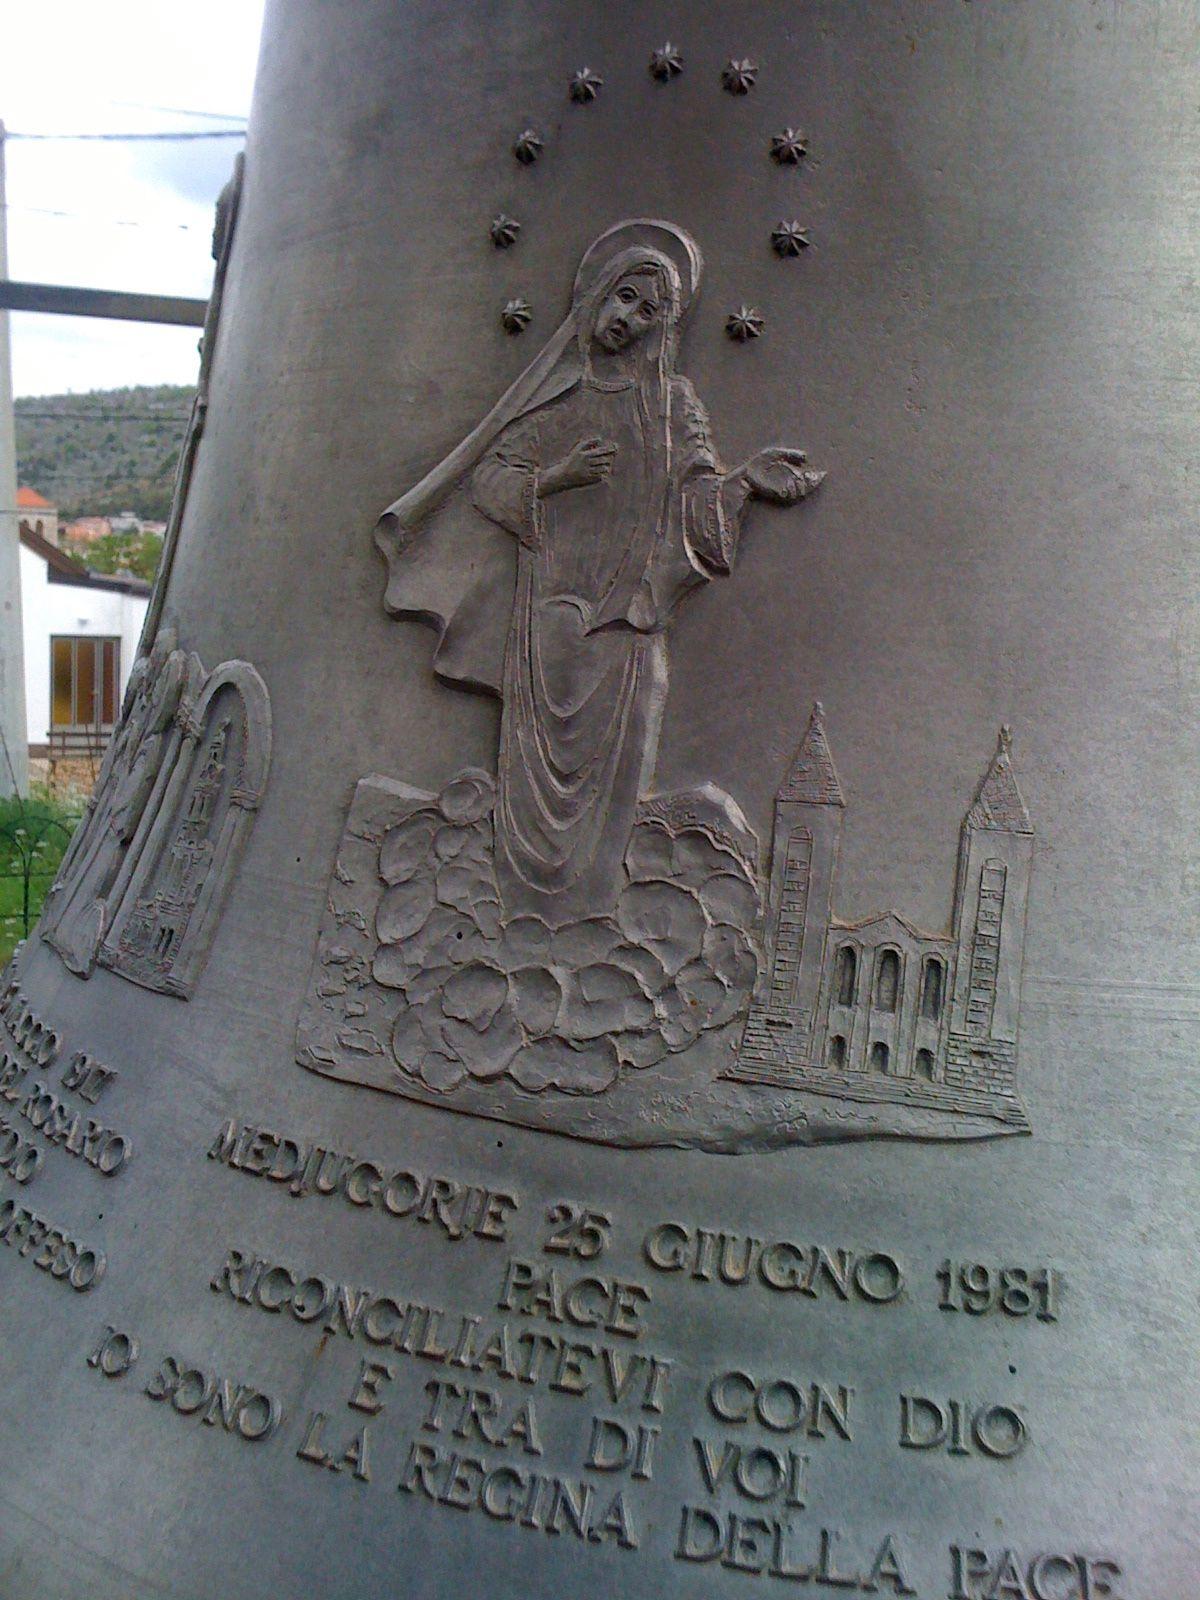 la cloche du dispensaire Padre Pio de Medjugorje y figure la Gospa de Medjugorje